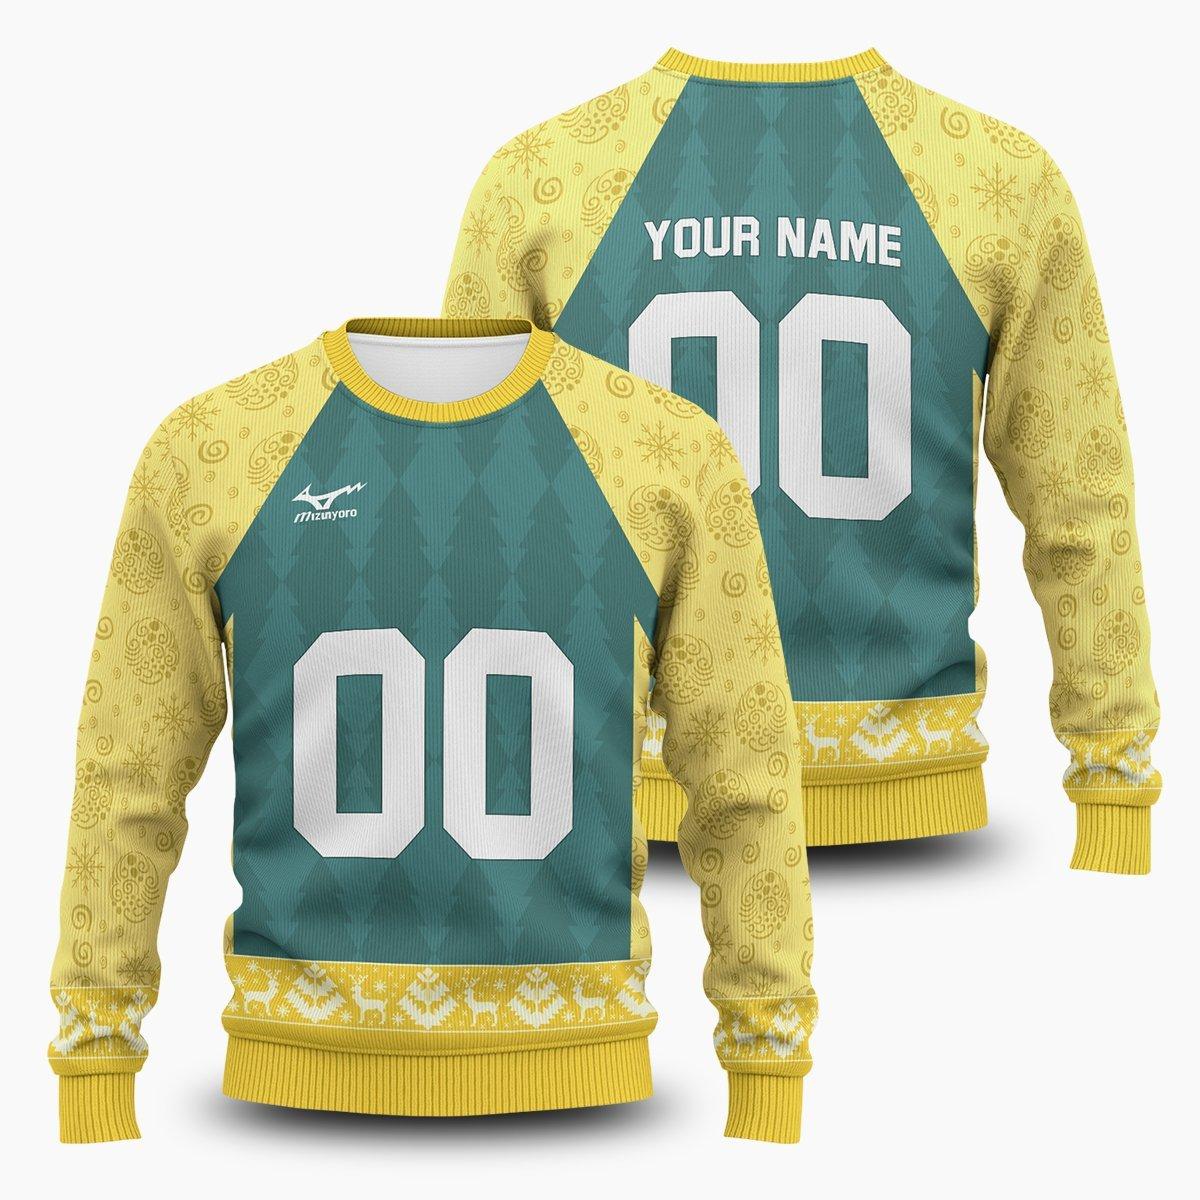 Personalized Team Nohebi Unisex Wool Sweater FDM0310 S Official Otaku Treat Merch